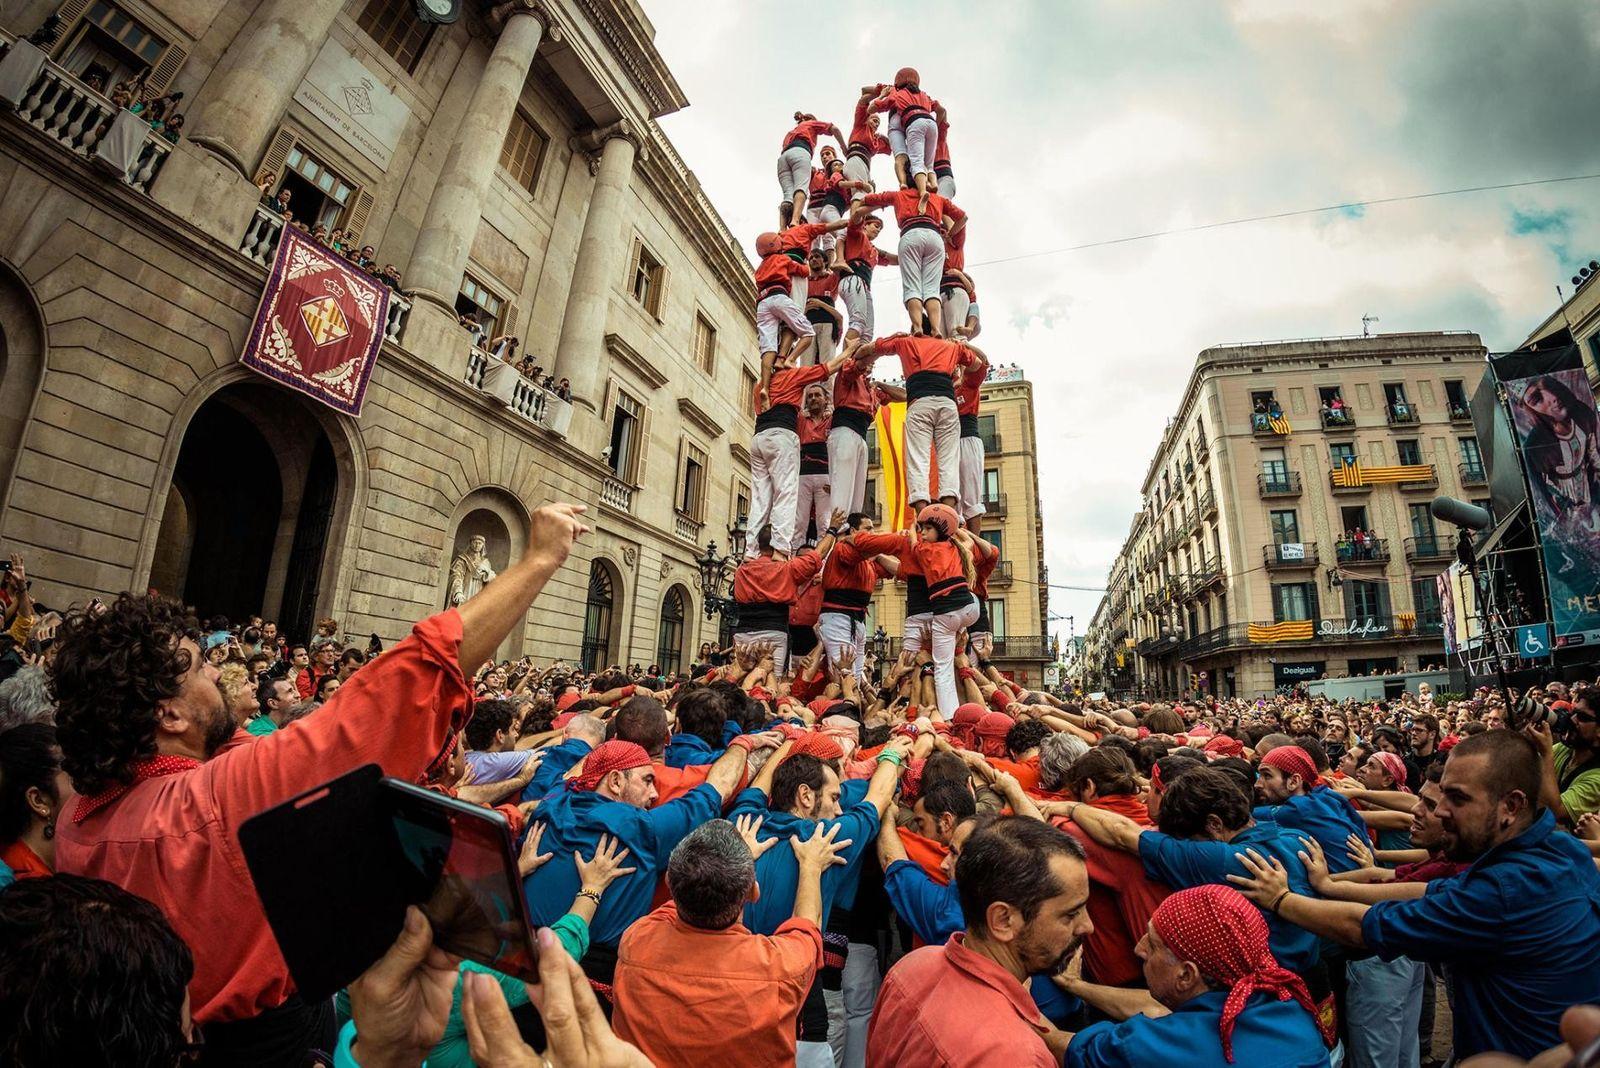 torres0humanas-castells-catalunia-barcelona